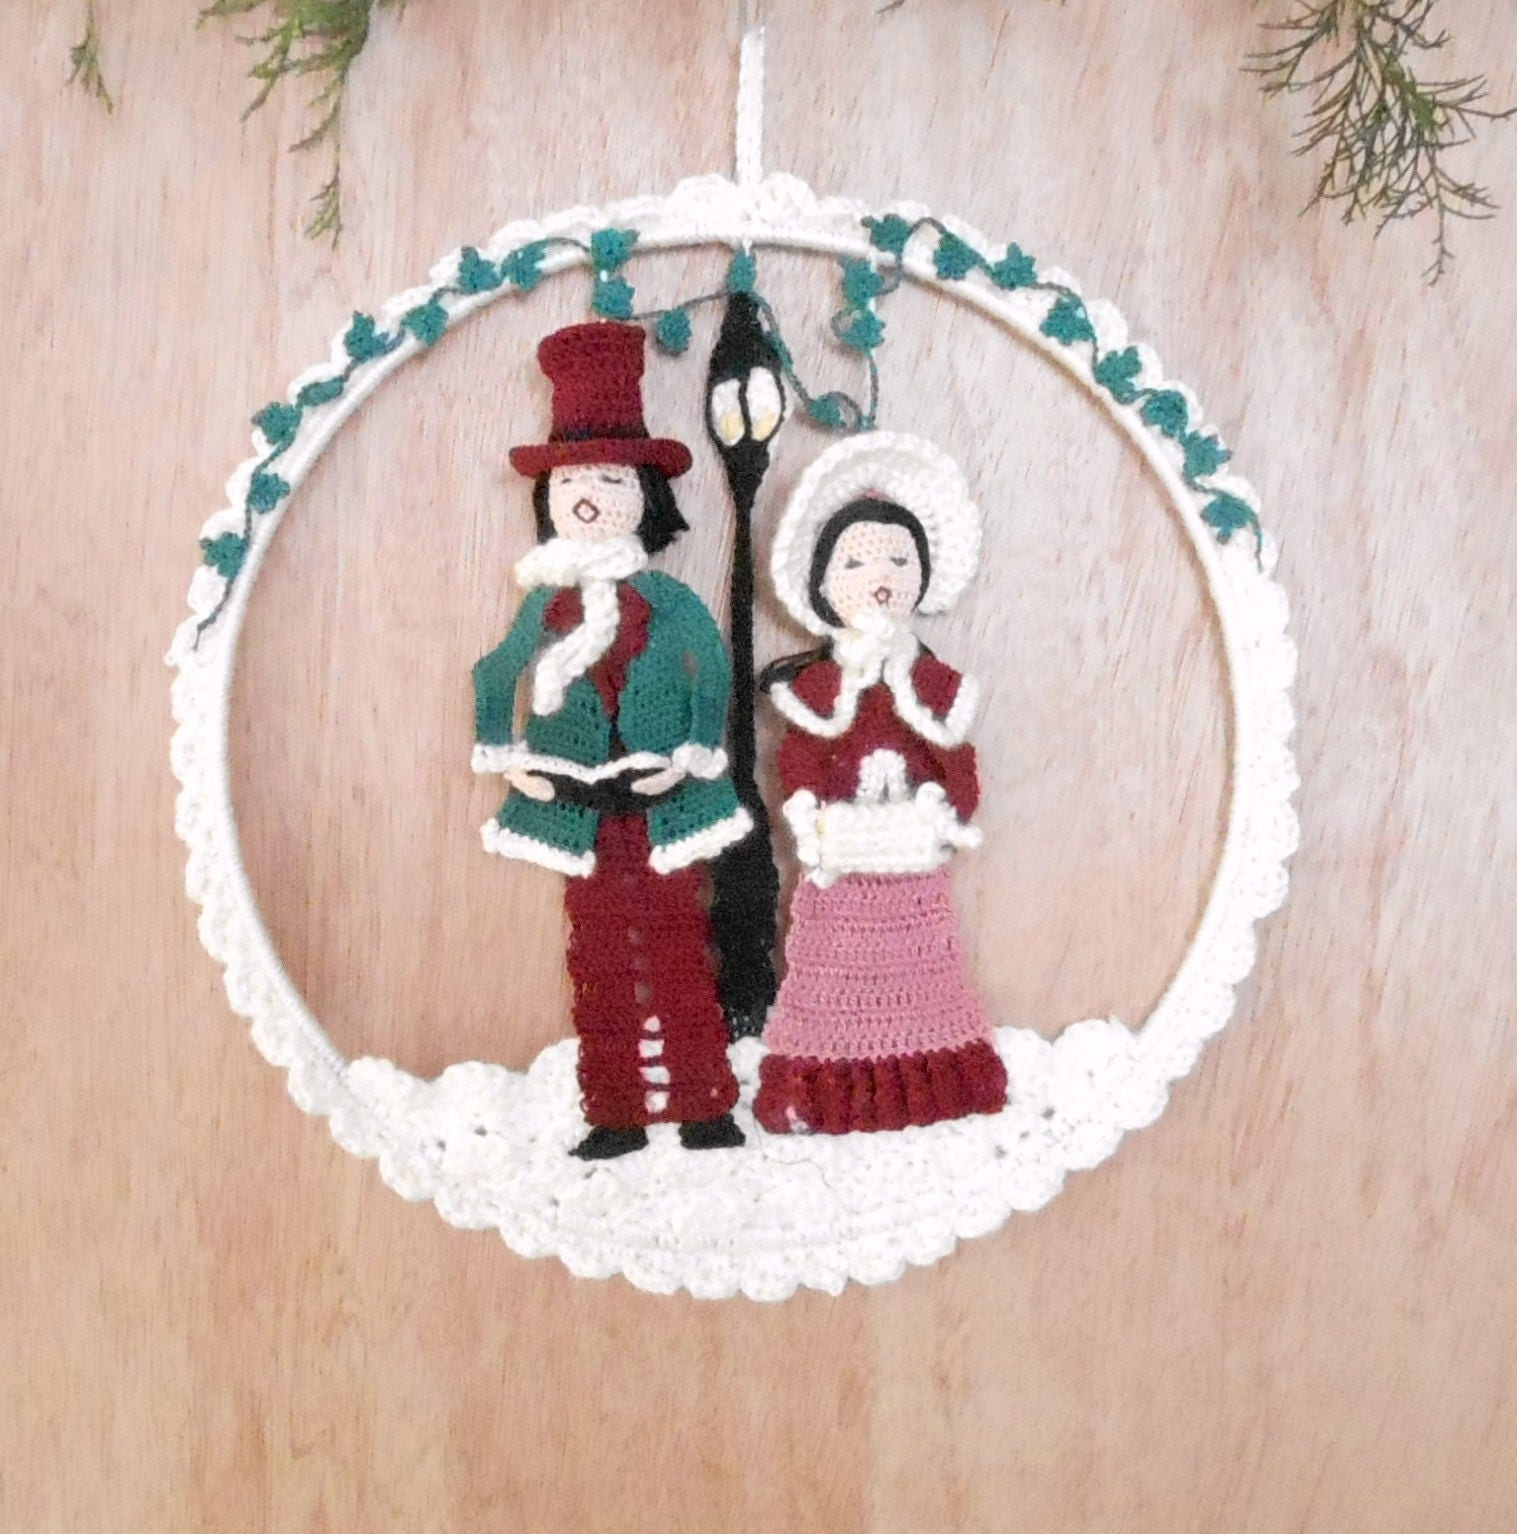 Decoration Ideas Are Christmas Carolers Decorations Needed: Christmas Carolers Wall Hanging Pattern, Christmas Holiday